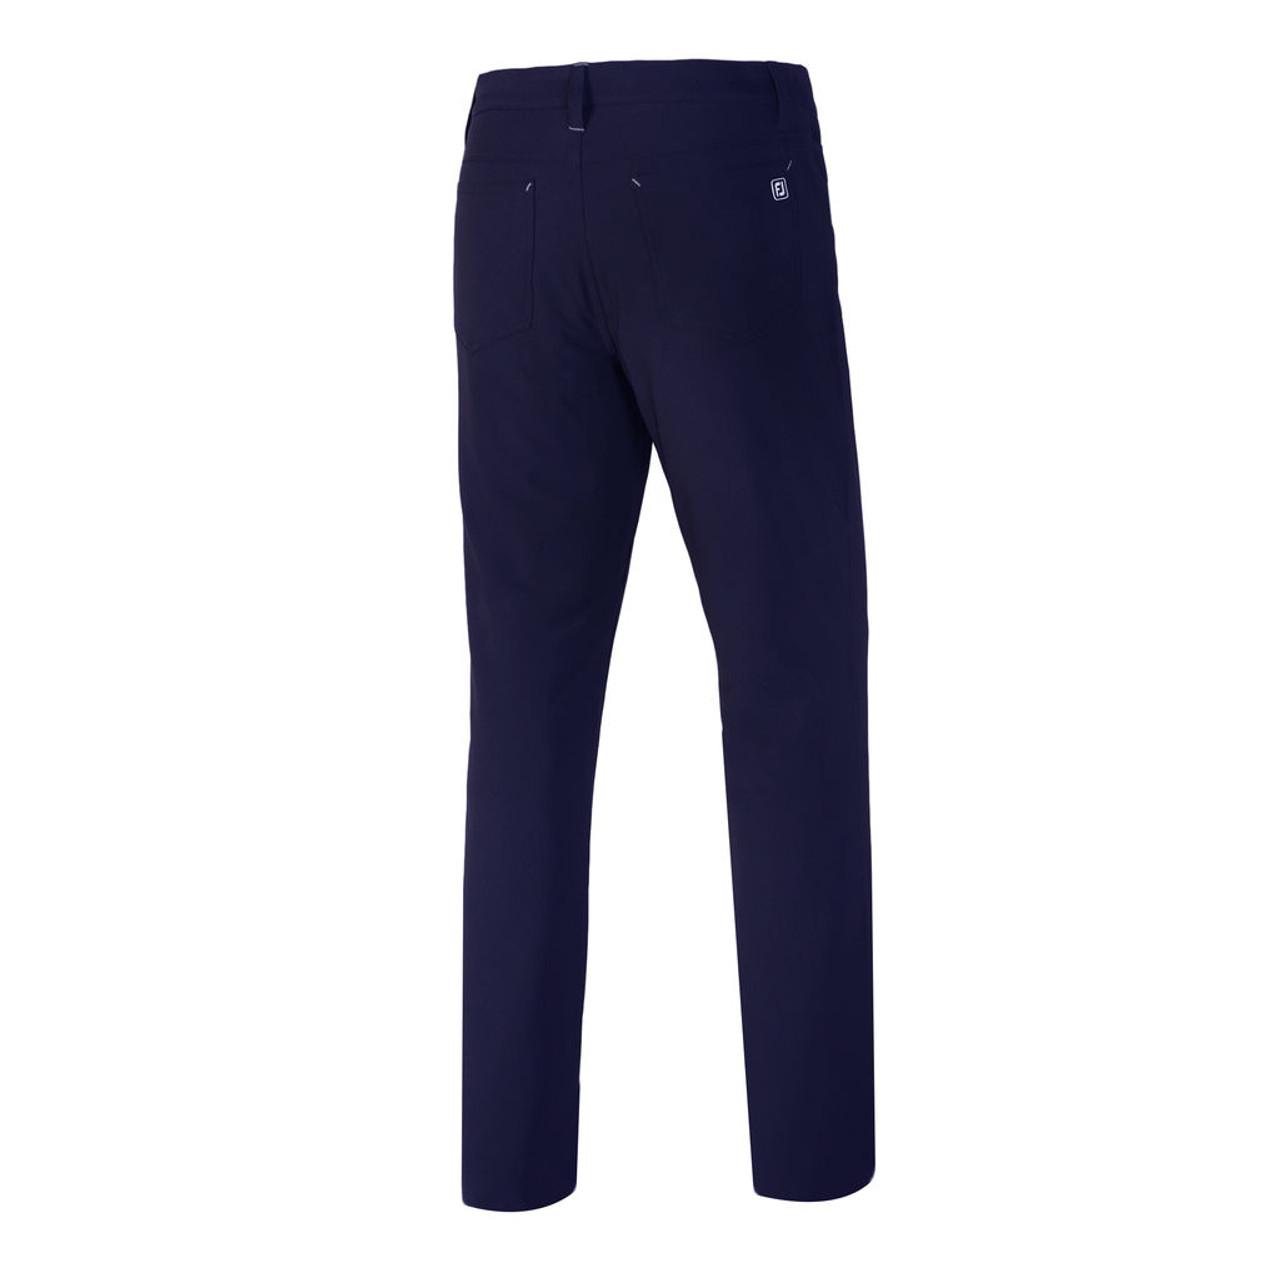 FootJoy Athletic Fit Performance 5-Pocket Pants - Navy (24353)